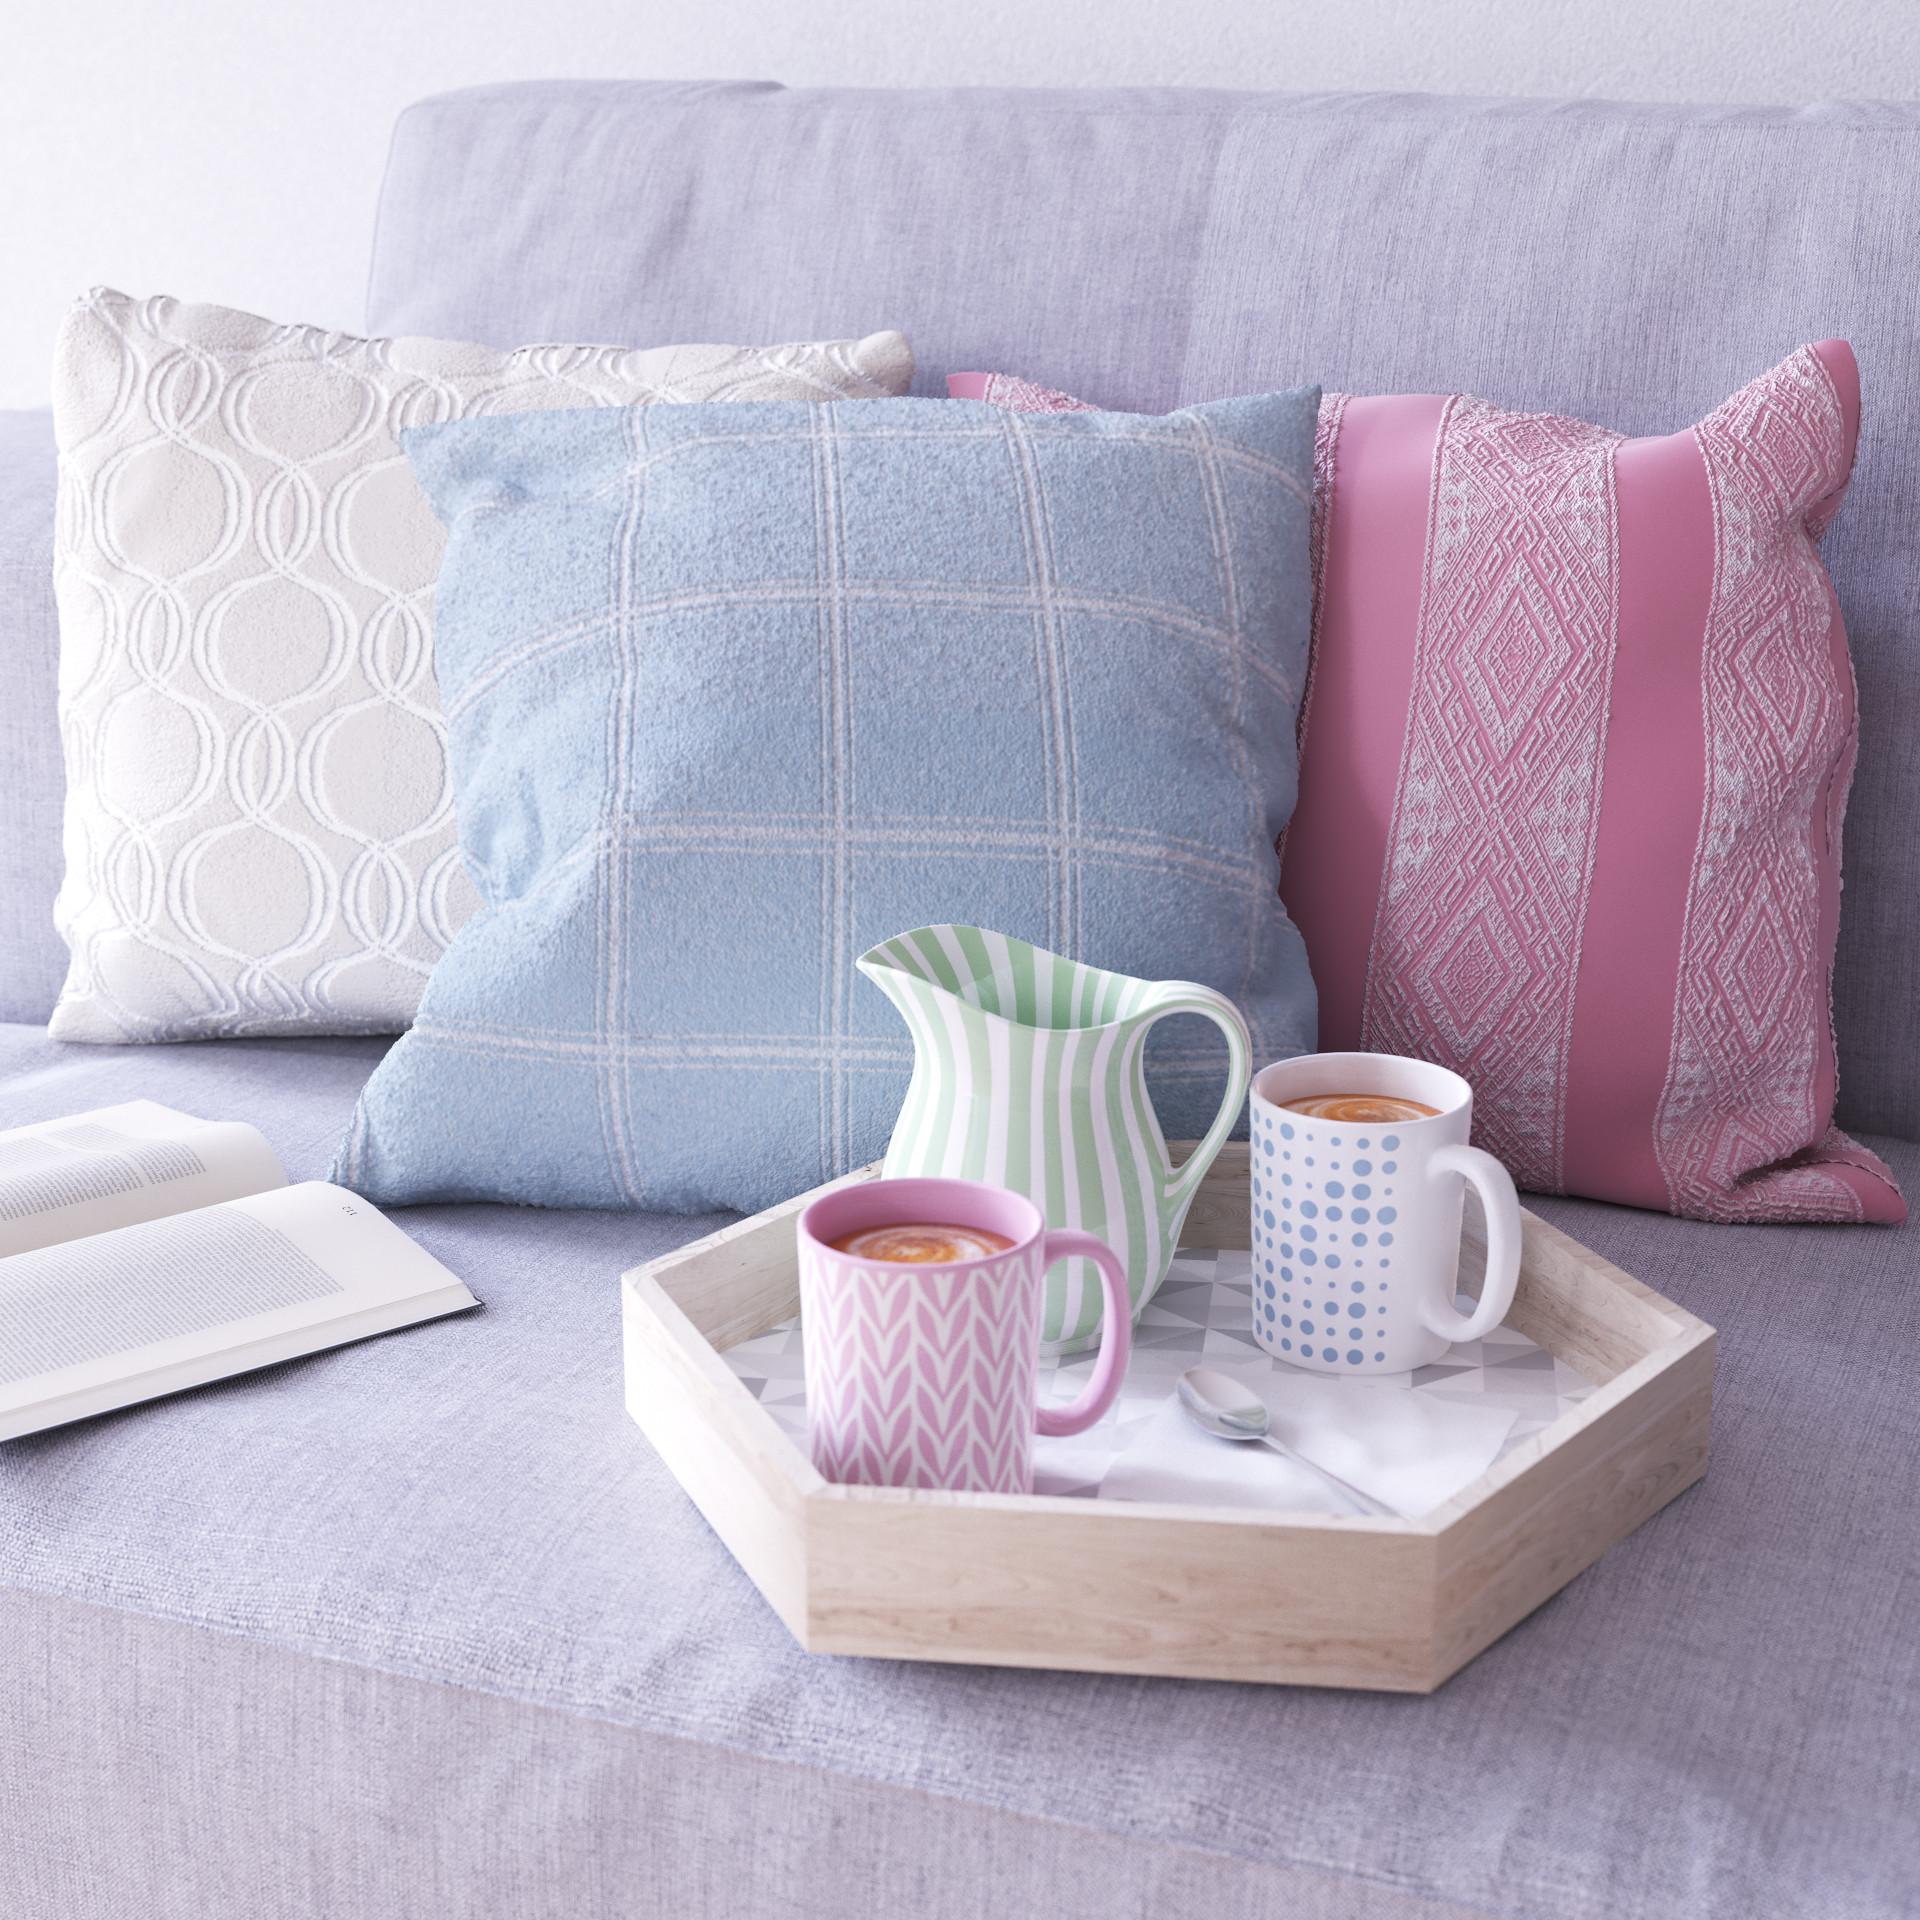 Francois bethermin pillows01